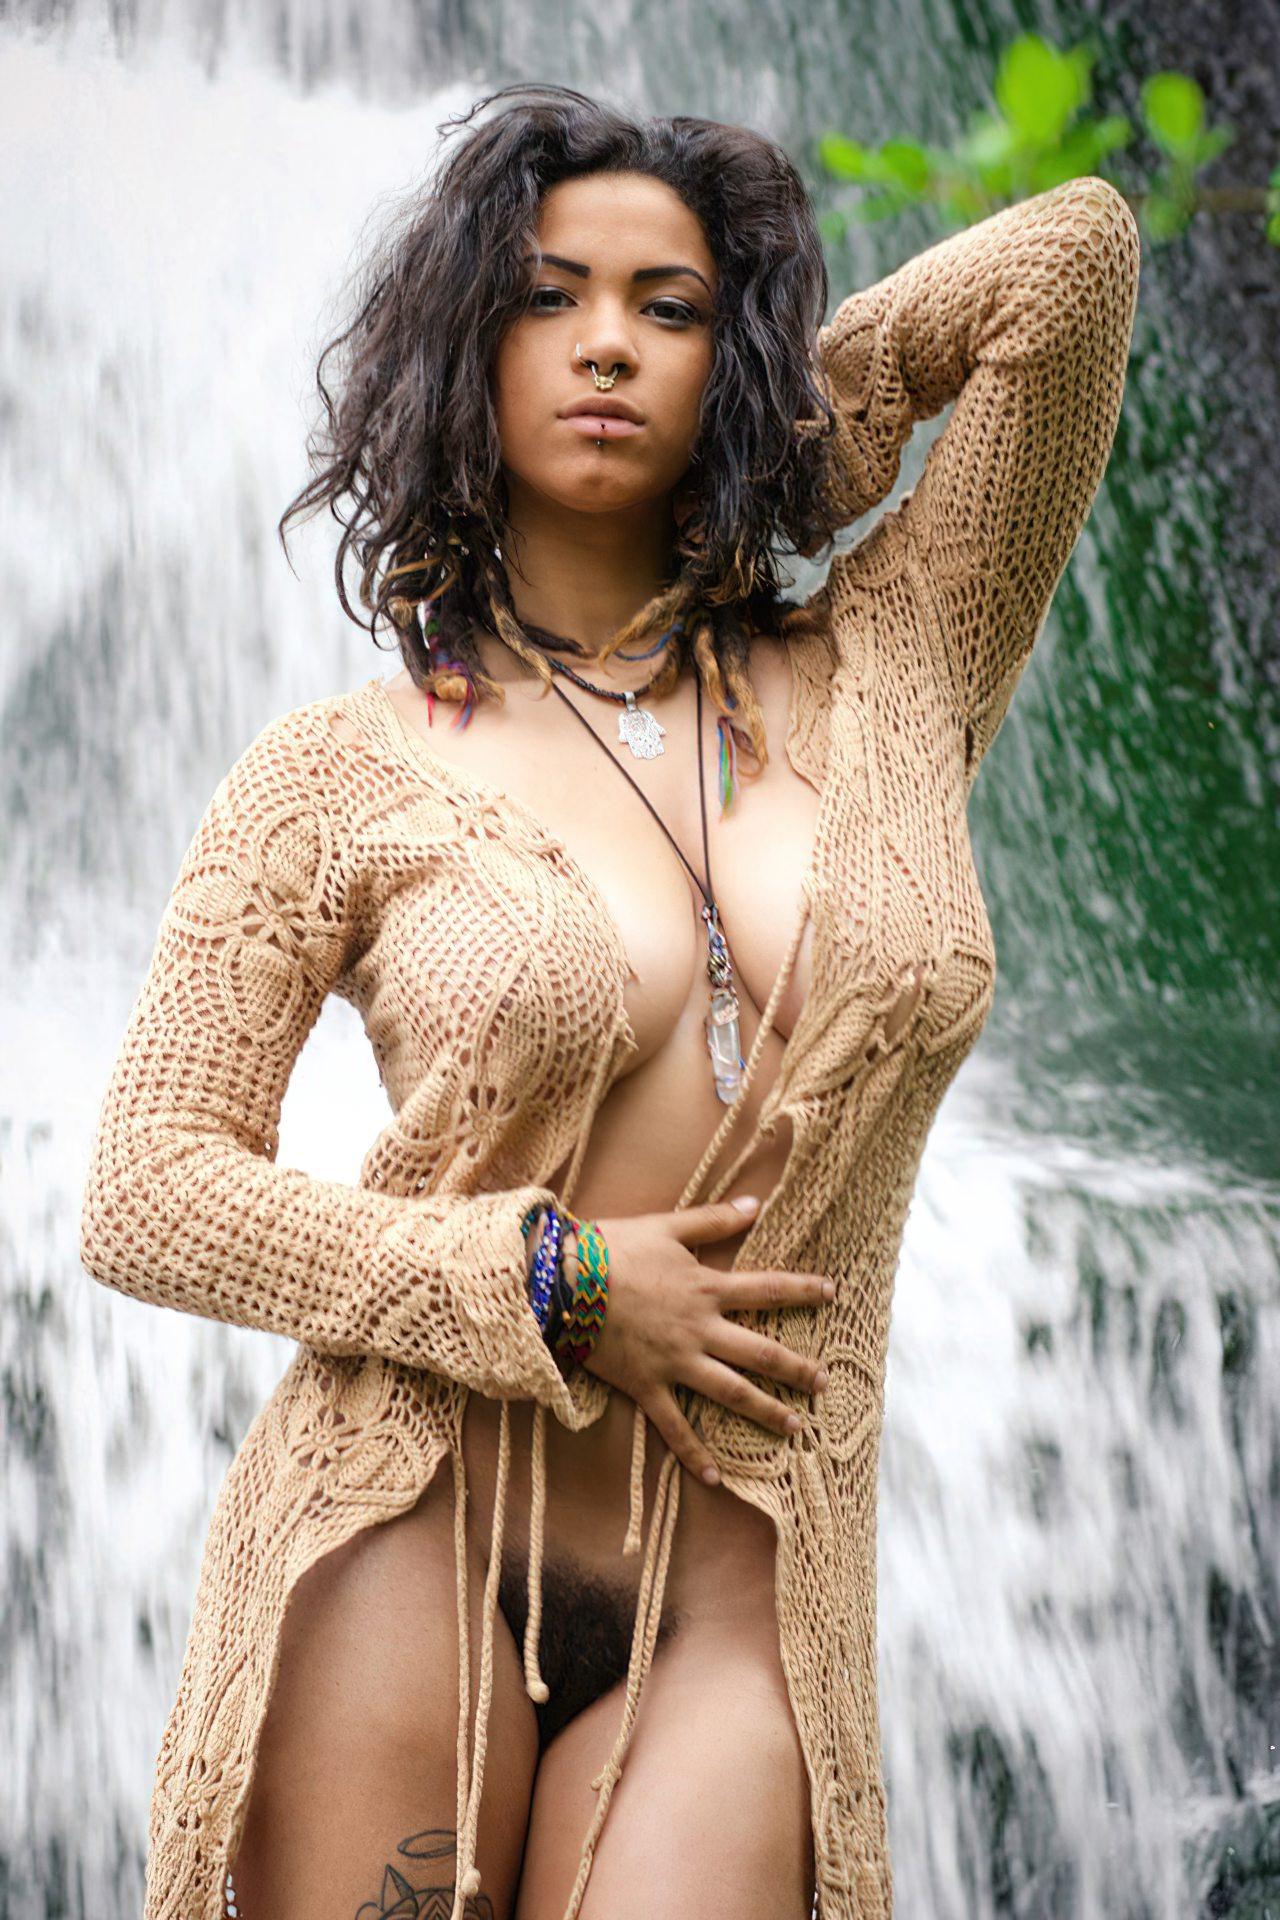 Moças Nuas (28)